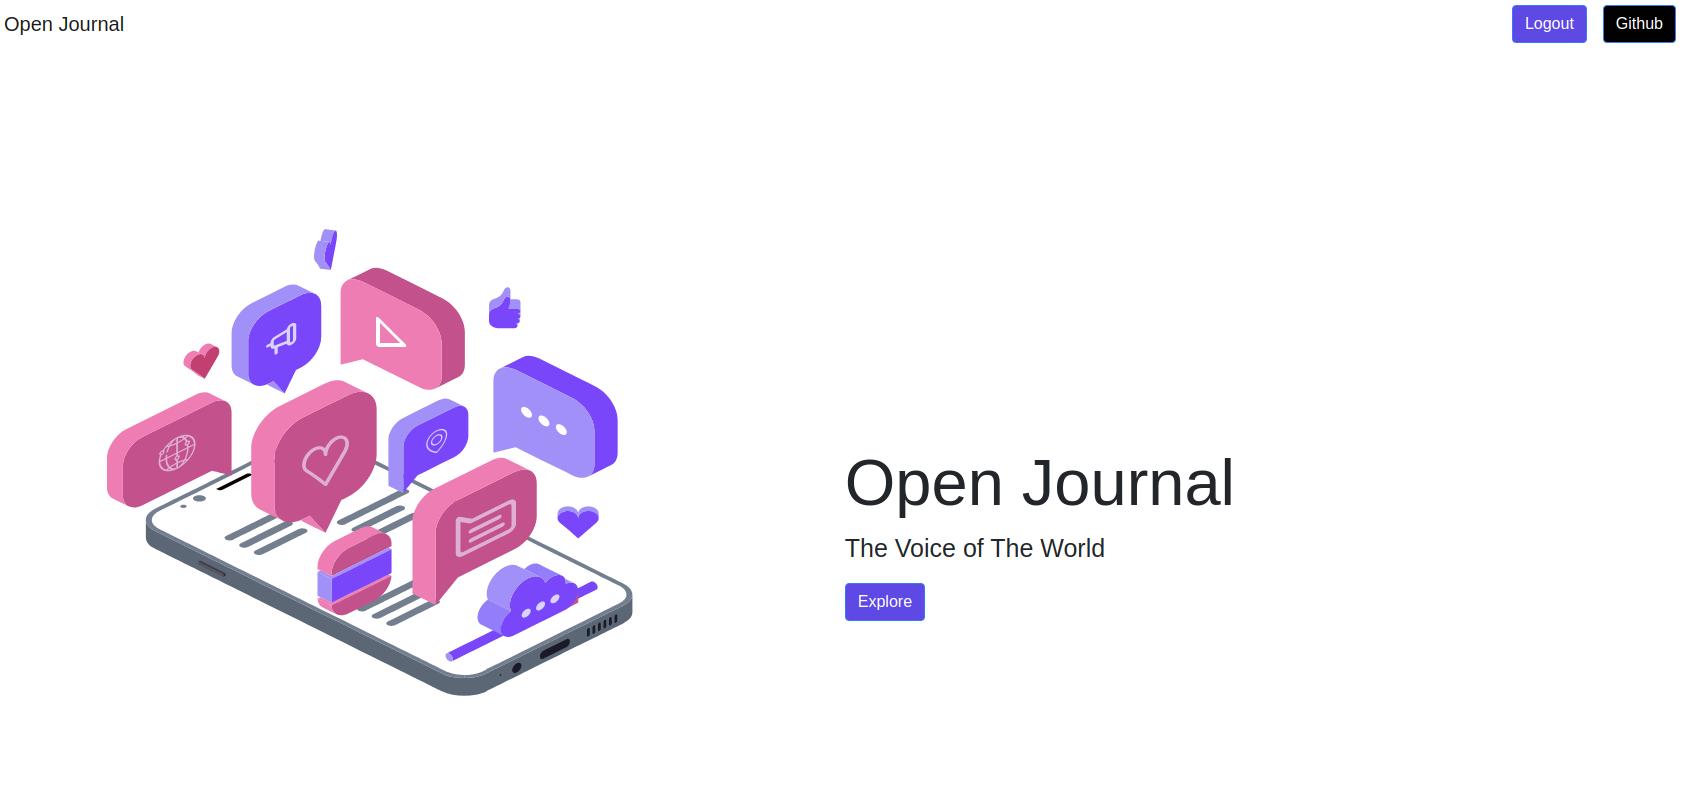 The Open Journal showcase